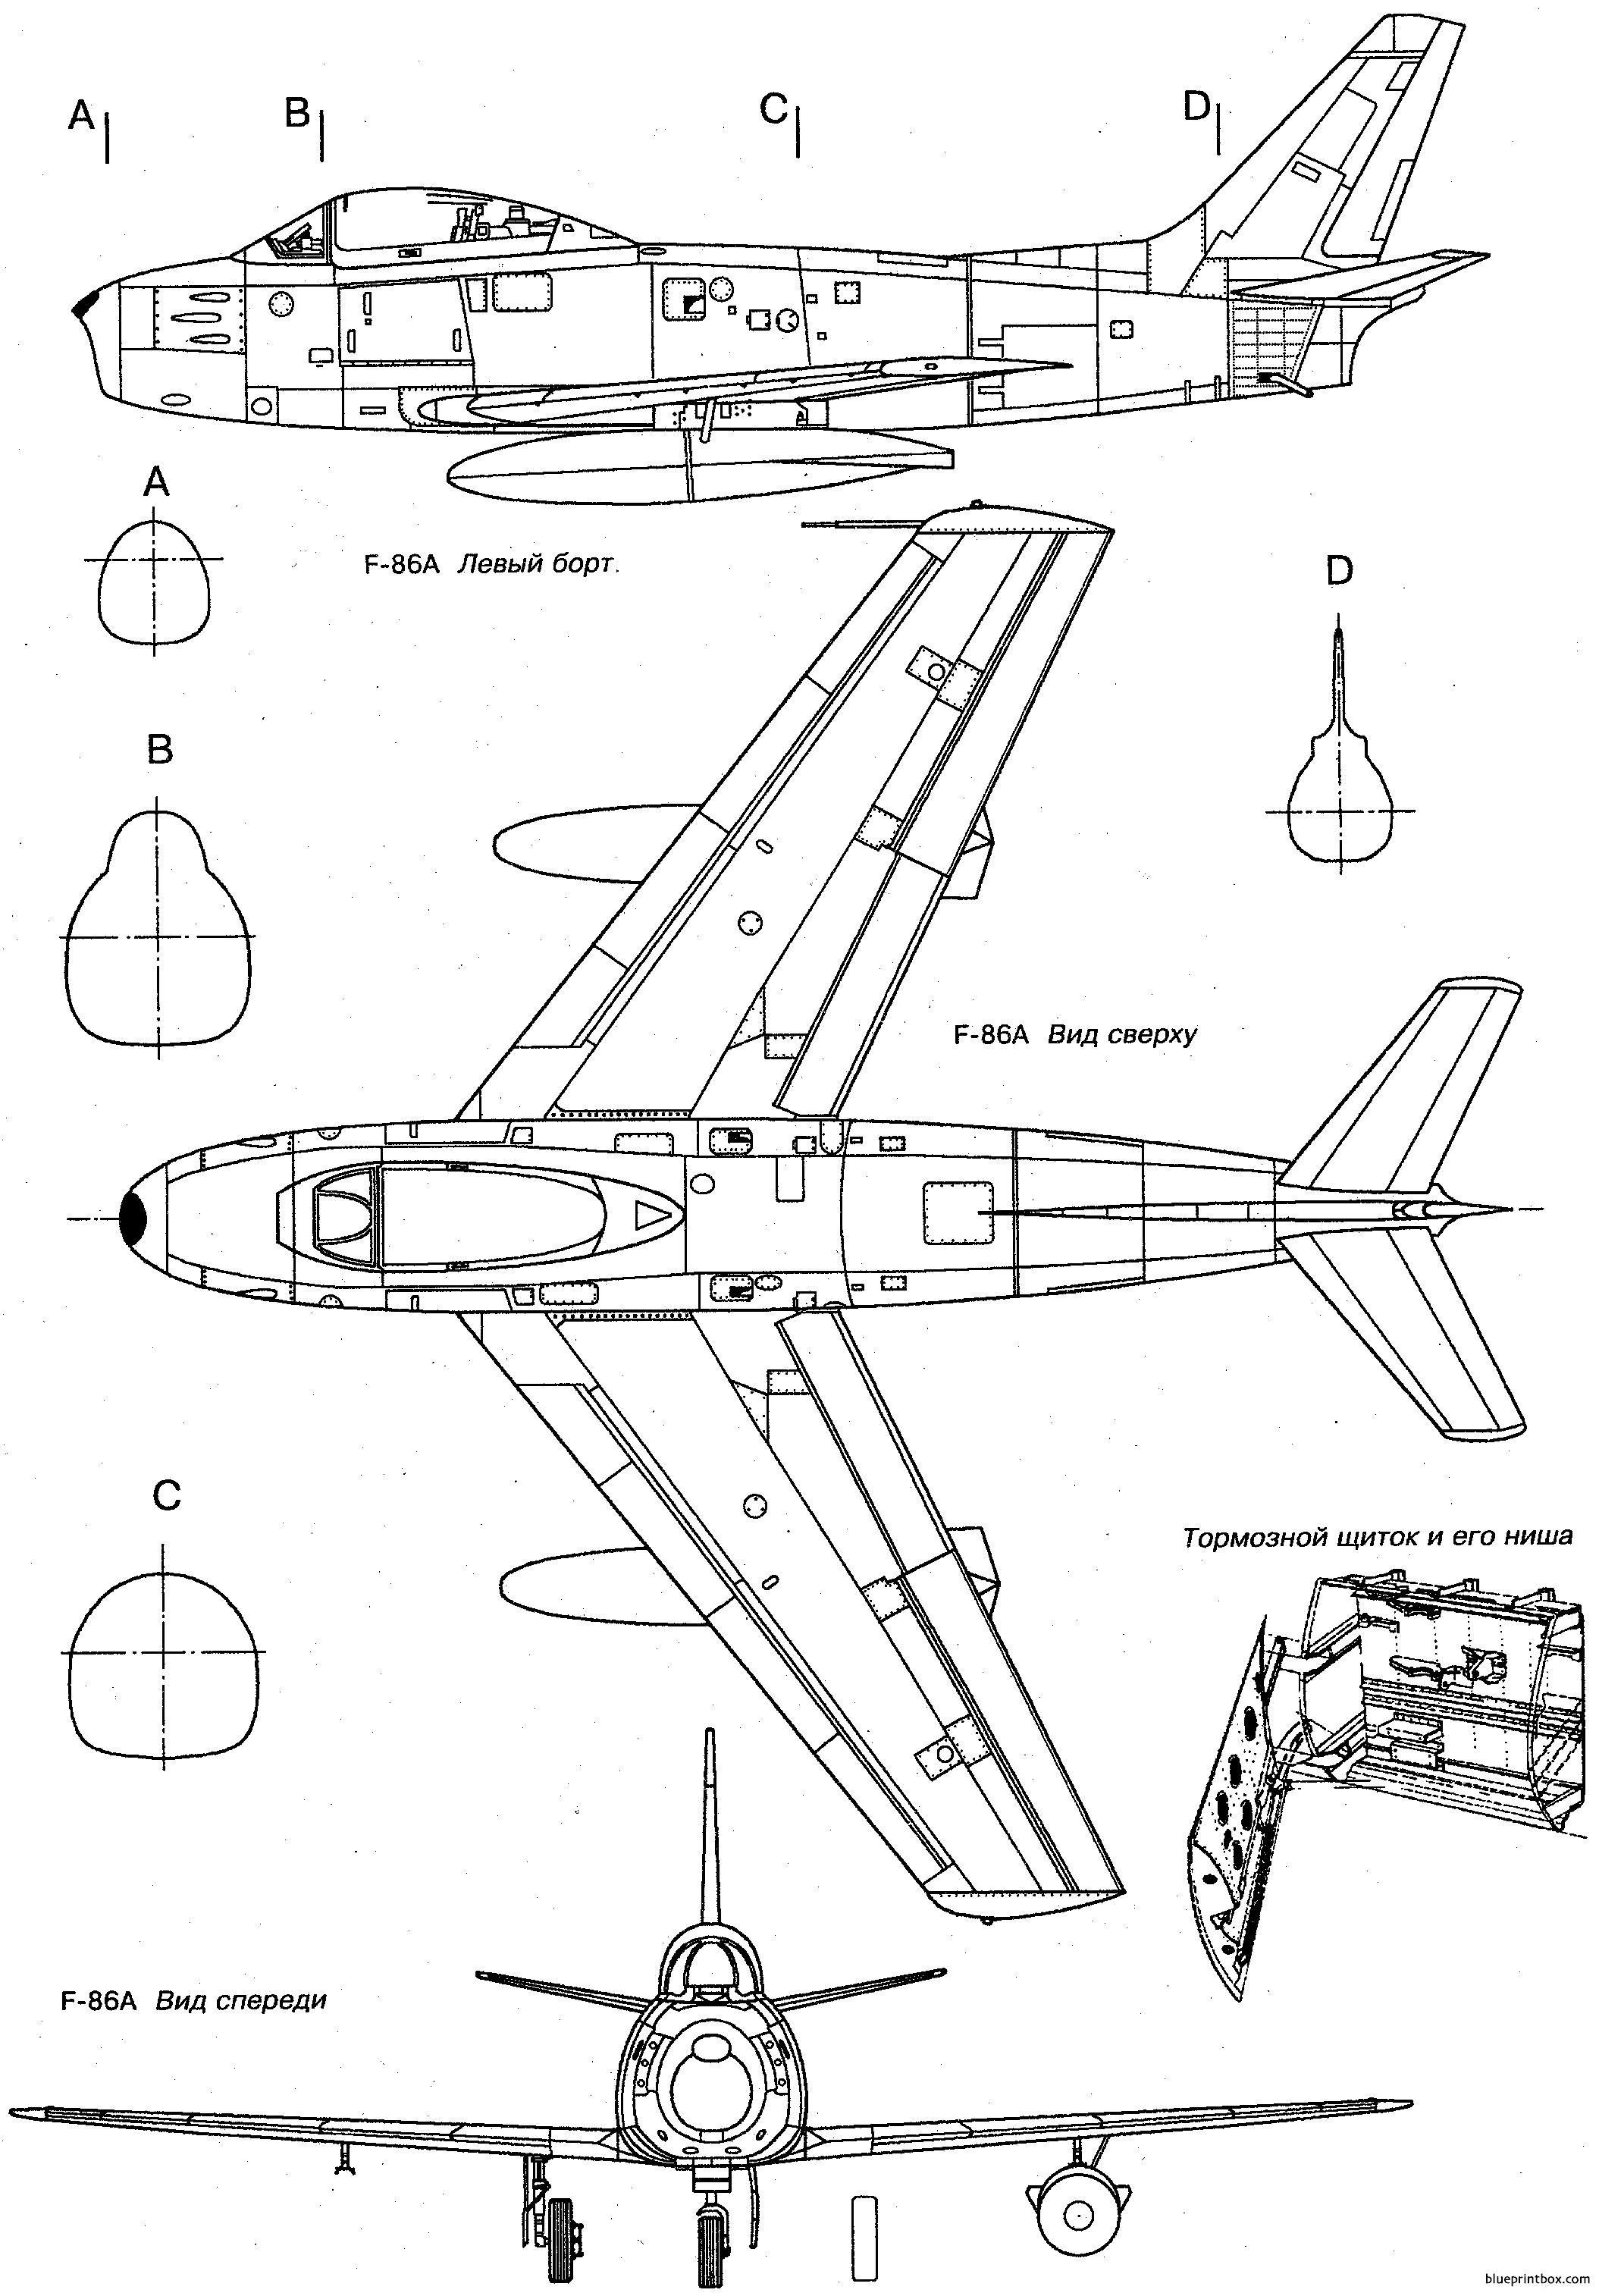 Aircraft Schematics Drawings Aircraft Get Free Image